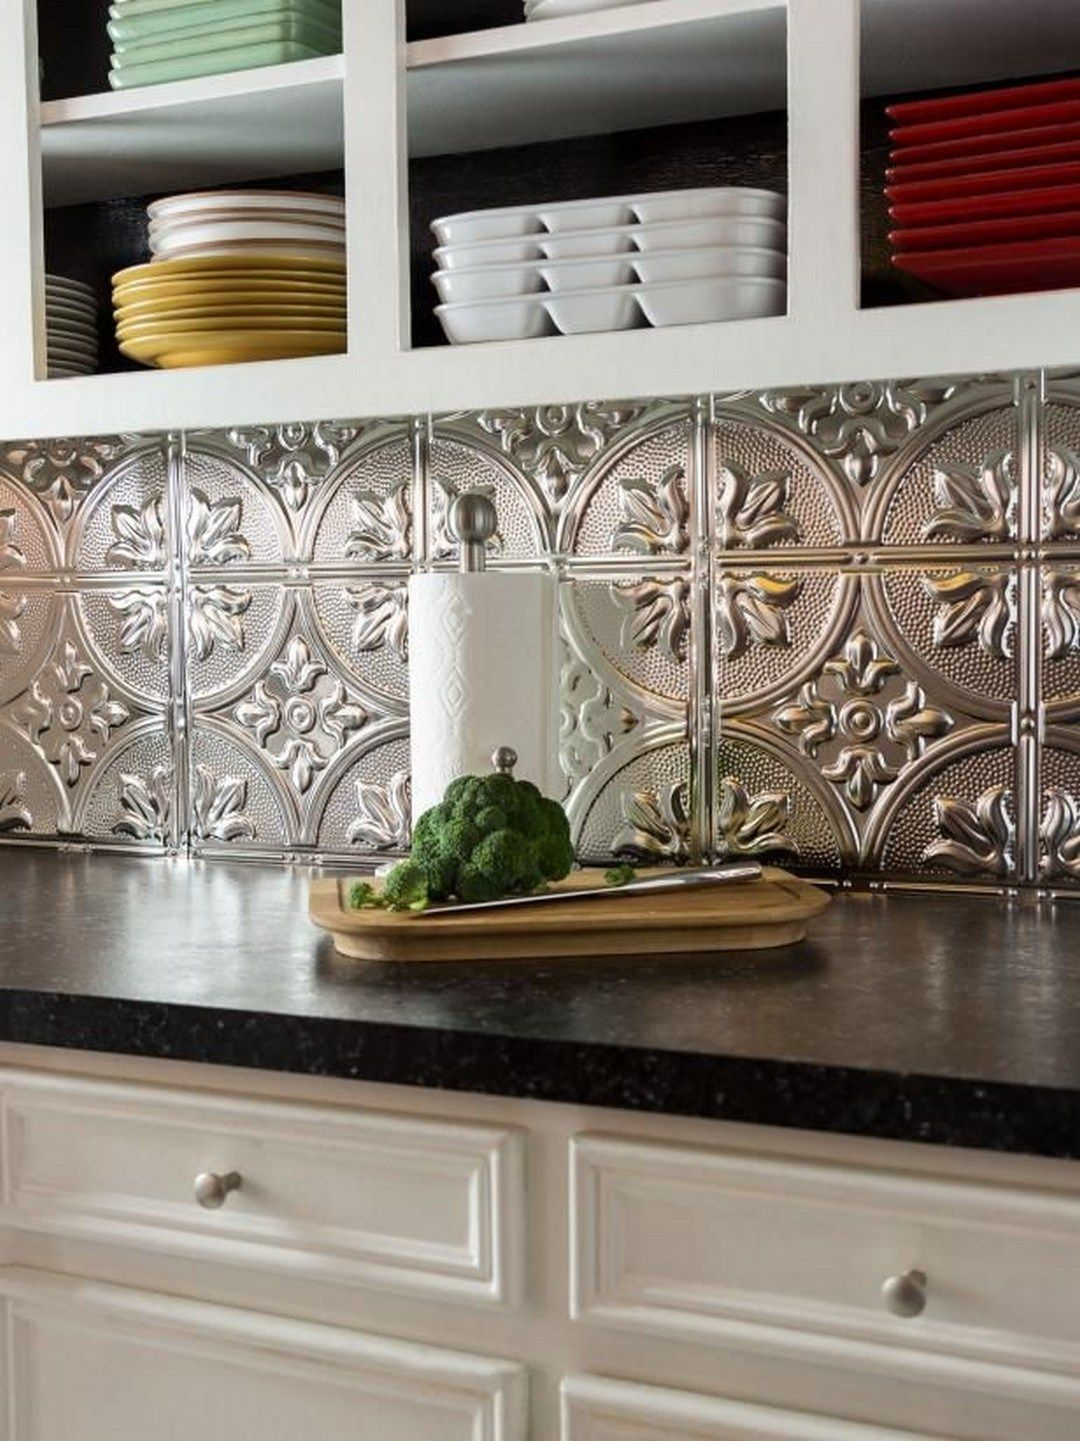 29 Cool Cheap Diy Kitchen Backsplash Ideas 8 Diy Kitchen Backsplash Kitchen Diy Makeover Diy Backsplash